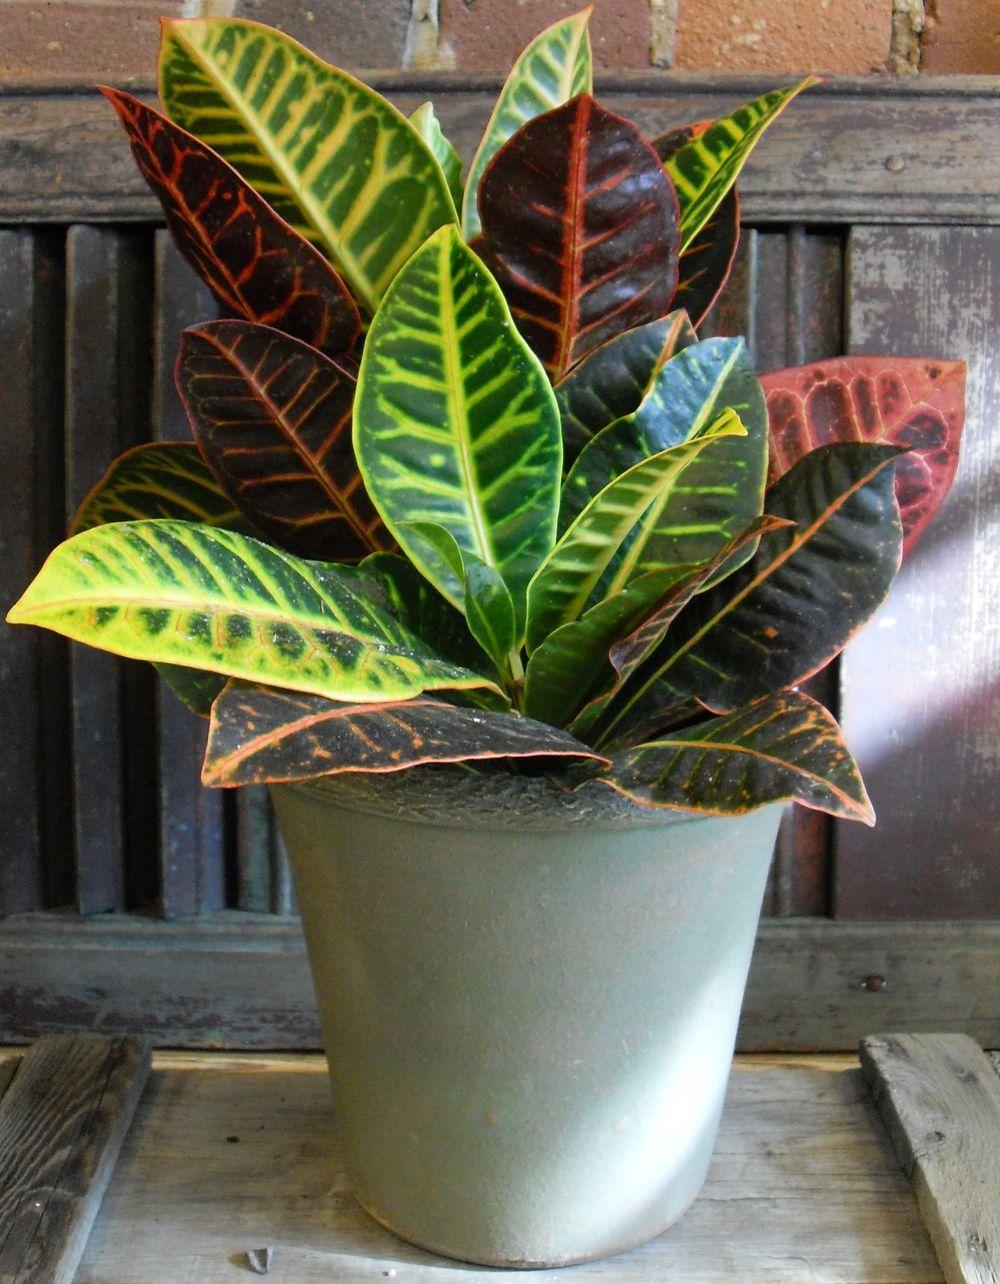 Best Kitchen Gallery: Ideas Tropical Indoor Plants 1sthomedecor Ideas of Tropical House Plants Identify  on rachelxblog.com